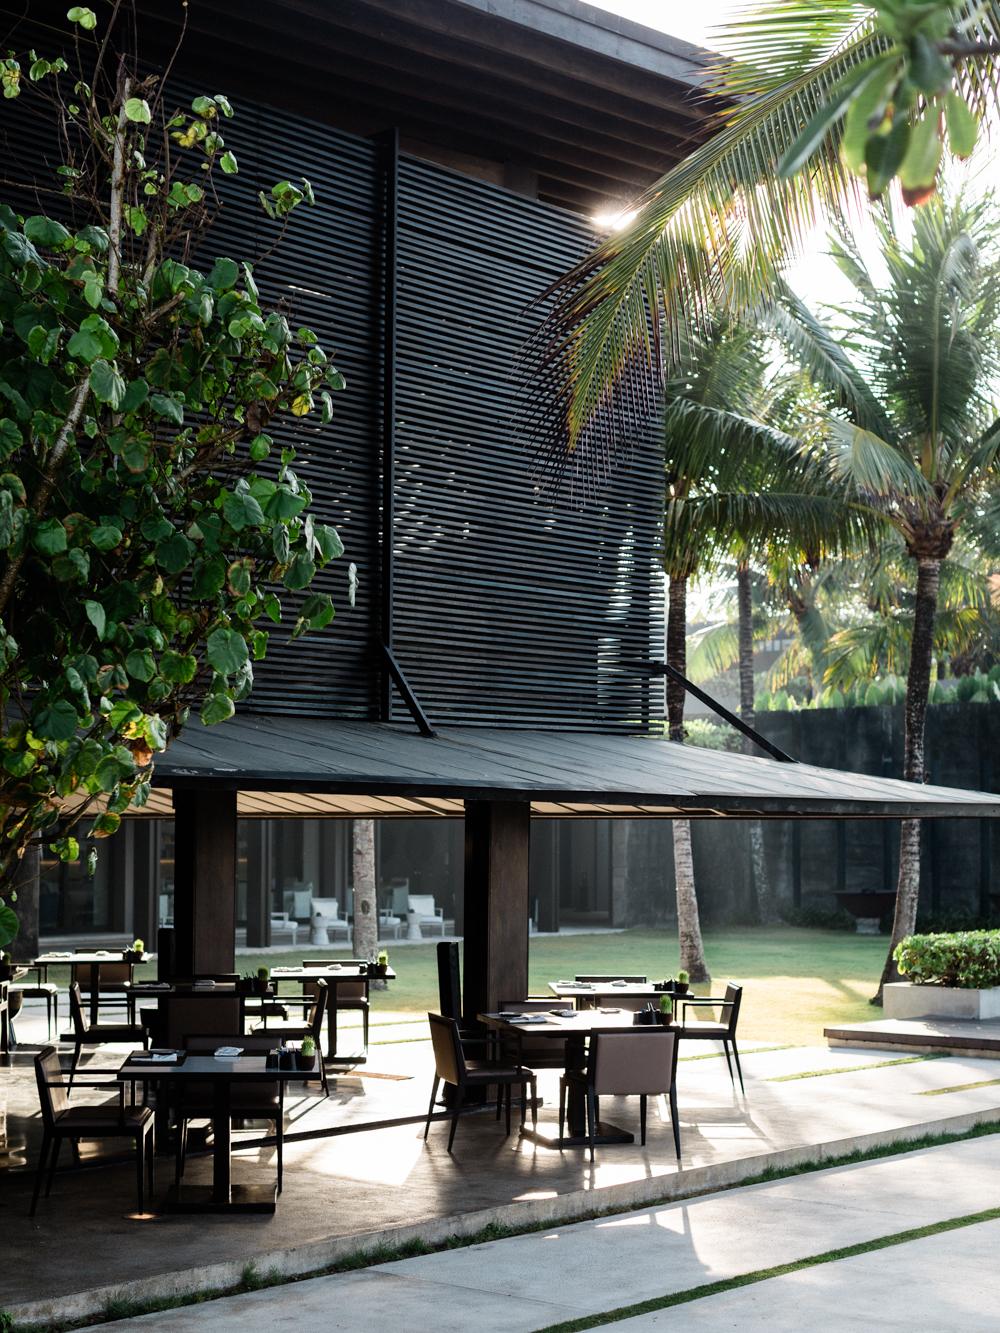 Bali_Real_Wedding_(c)_Rory_Wylie-8.jpg